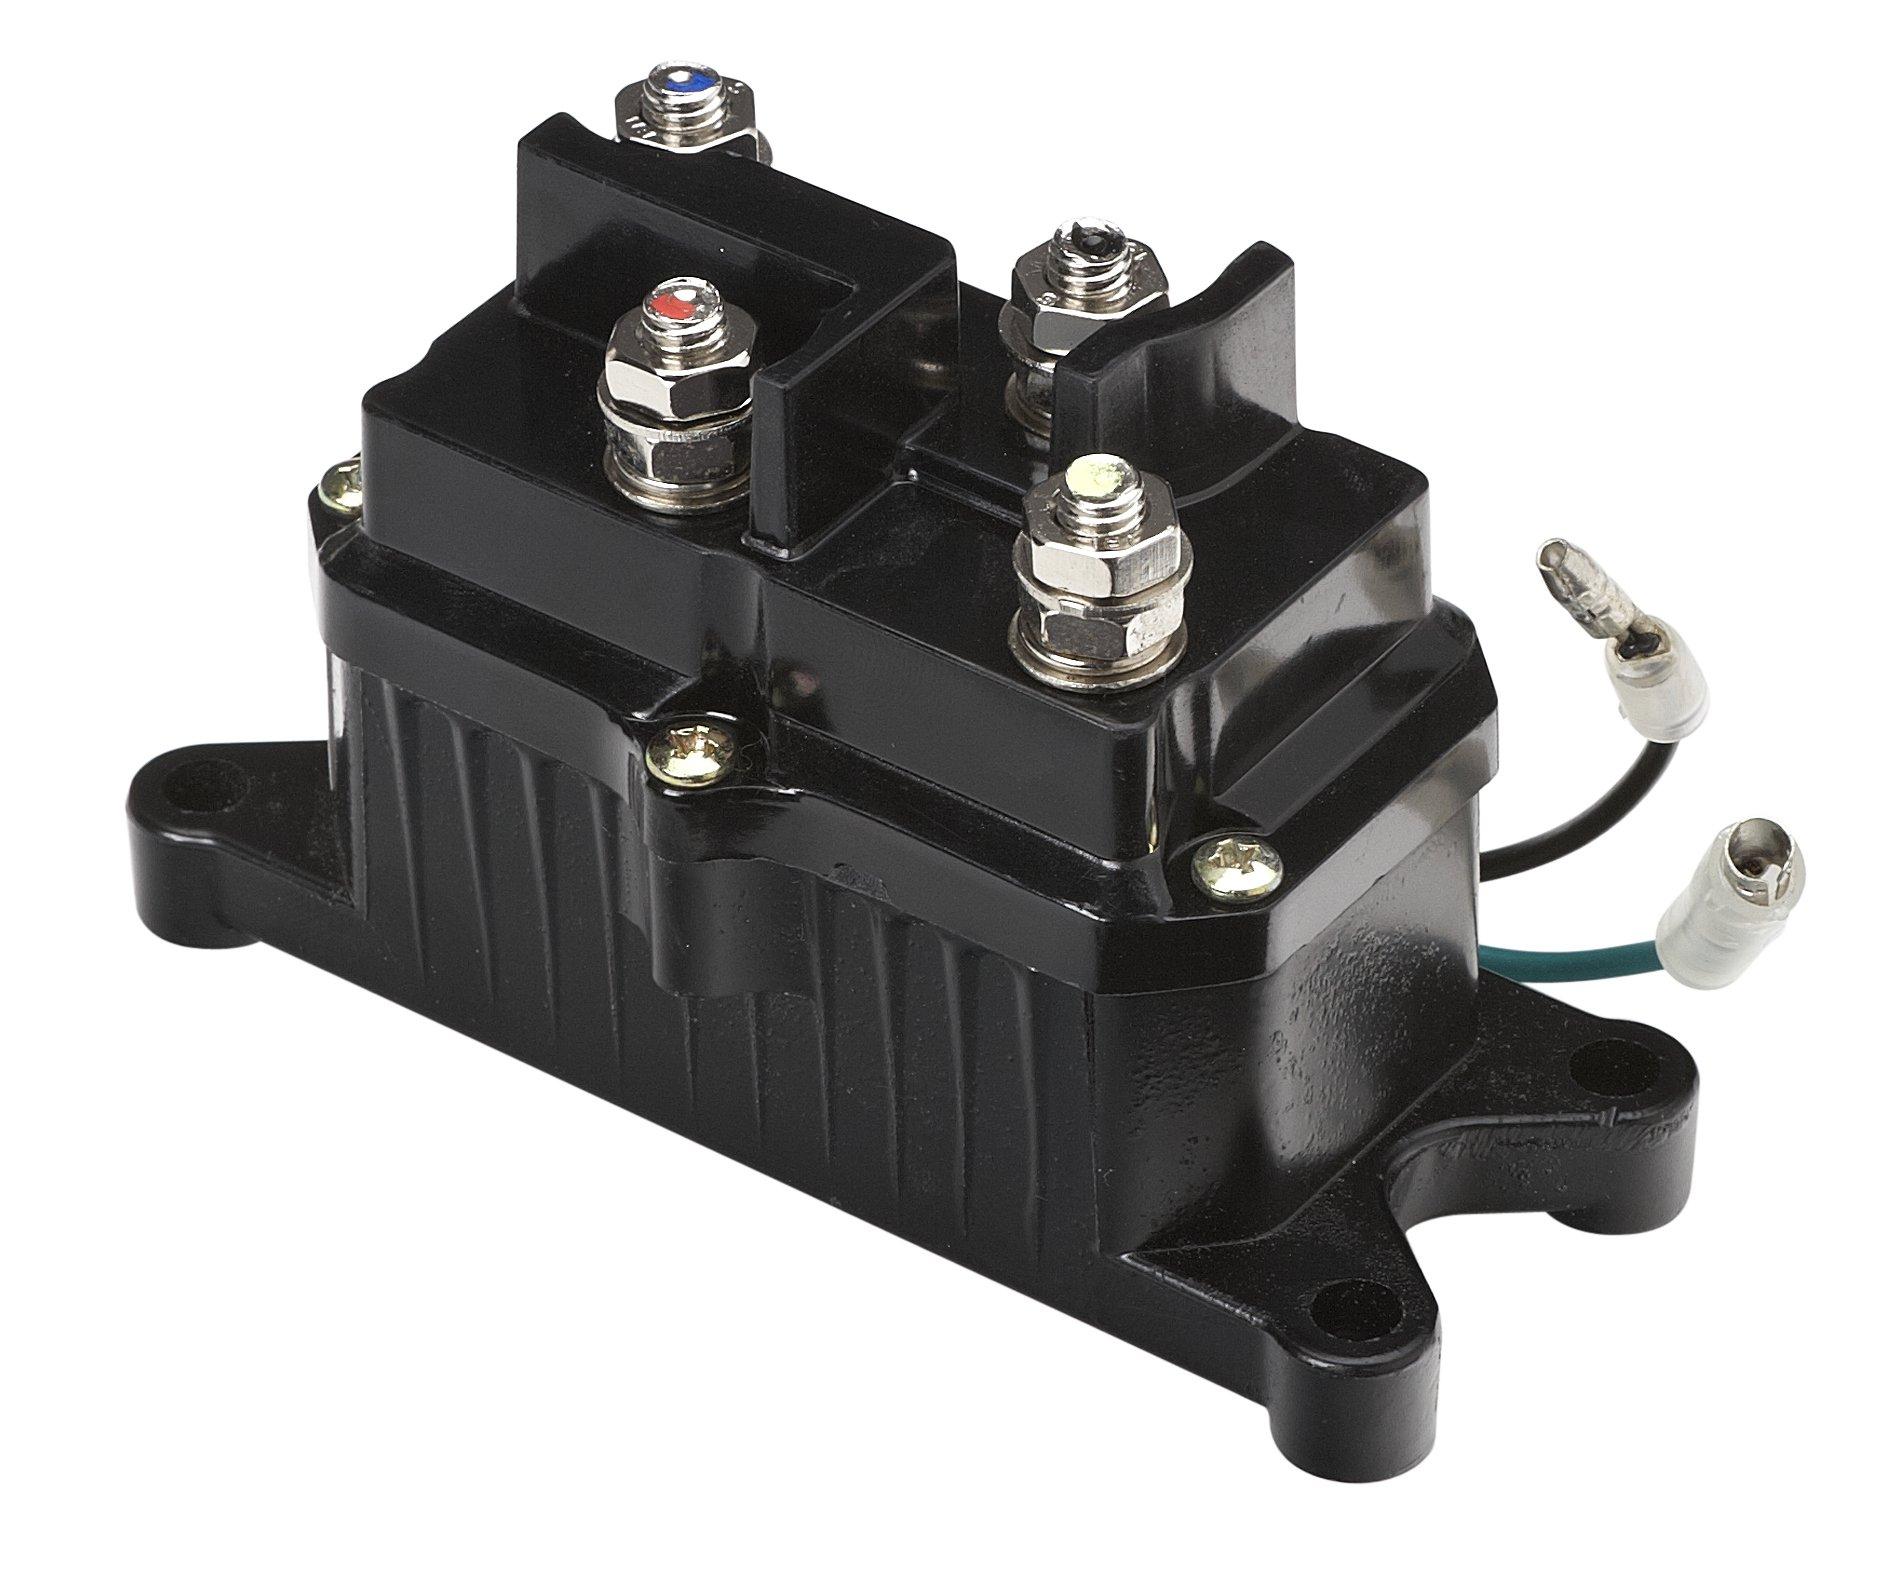 VIPER ATV/UTV Replacement Contactor 1500lb-3000lb Winches by MotoAlliance